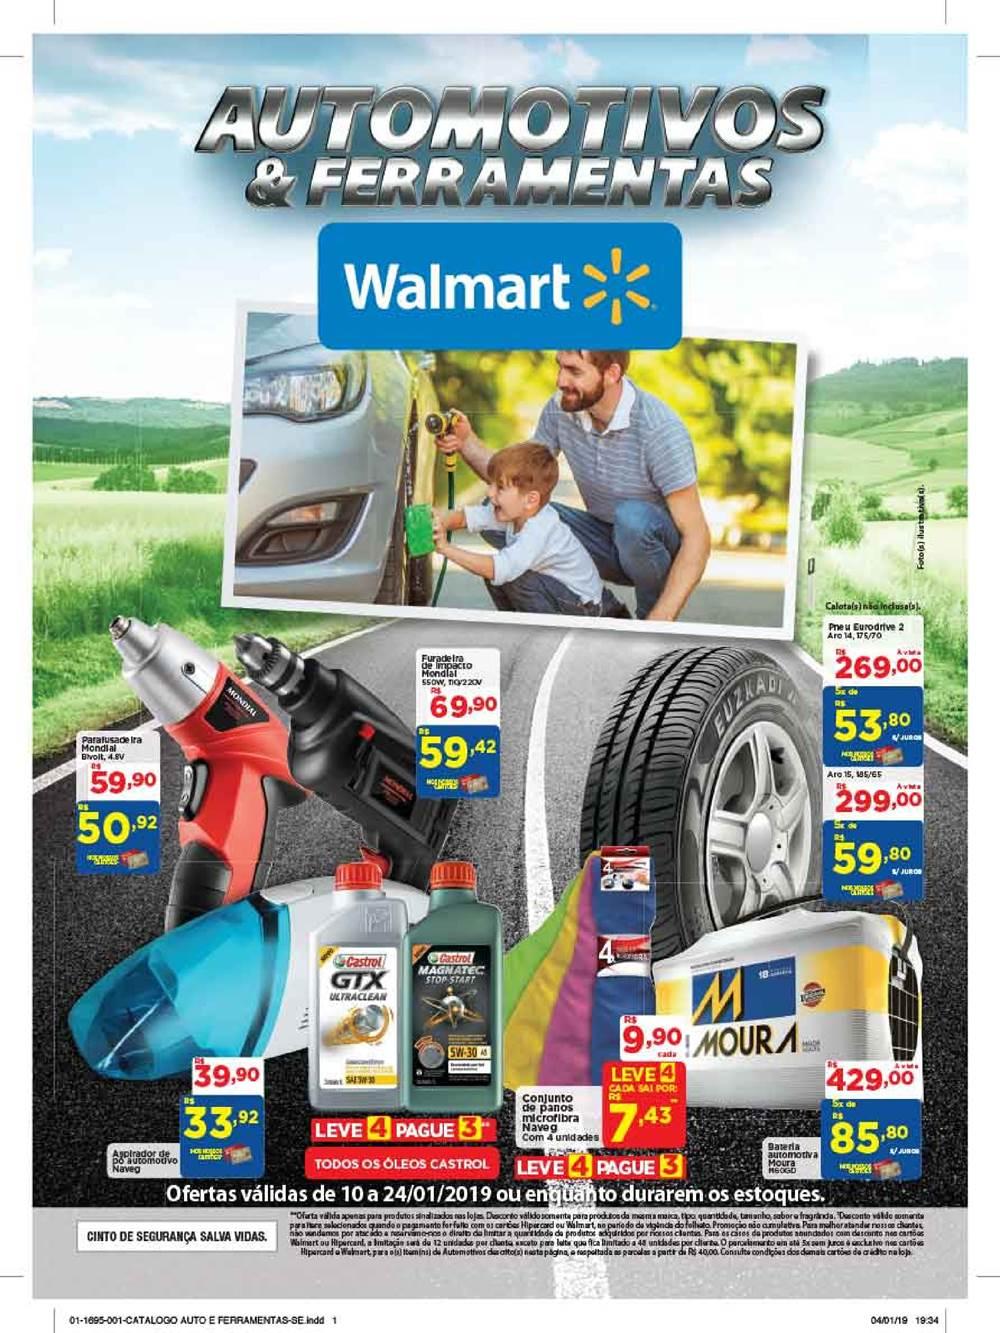 Ofertas-pneu1 Walmart até 17/02